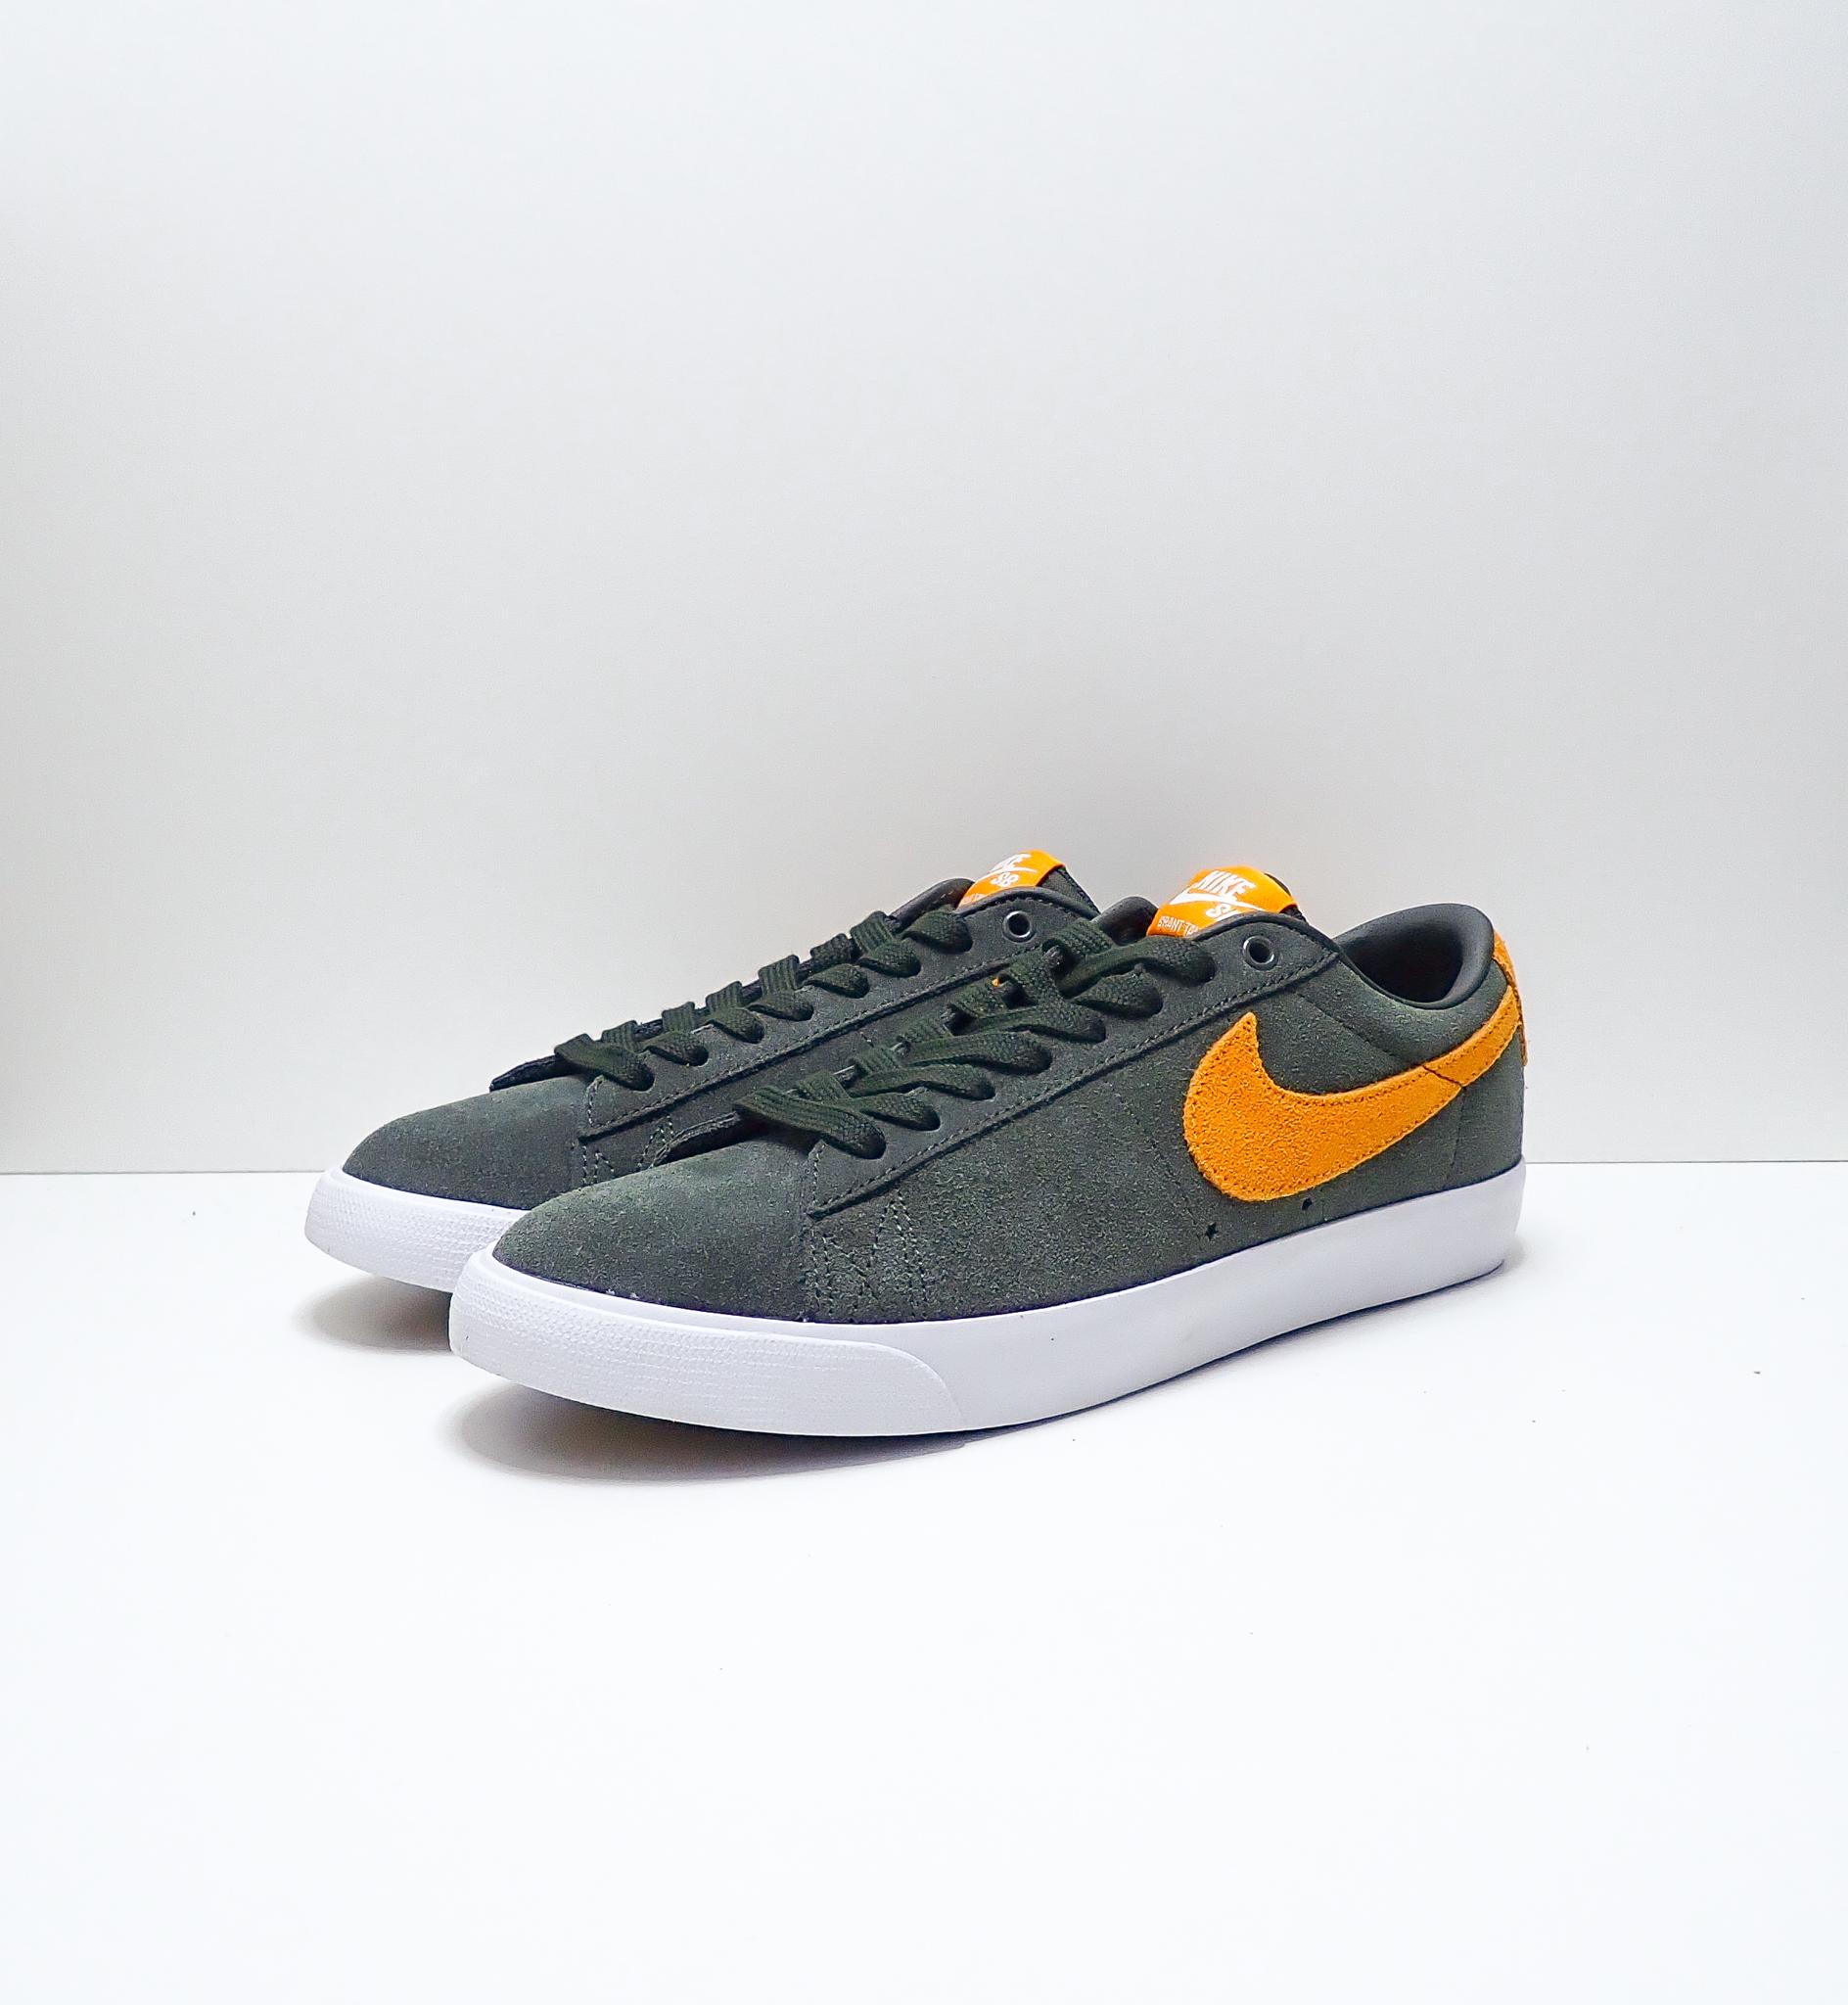 Nike SB Blazer Low GT Sequoia Kumquat